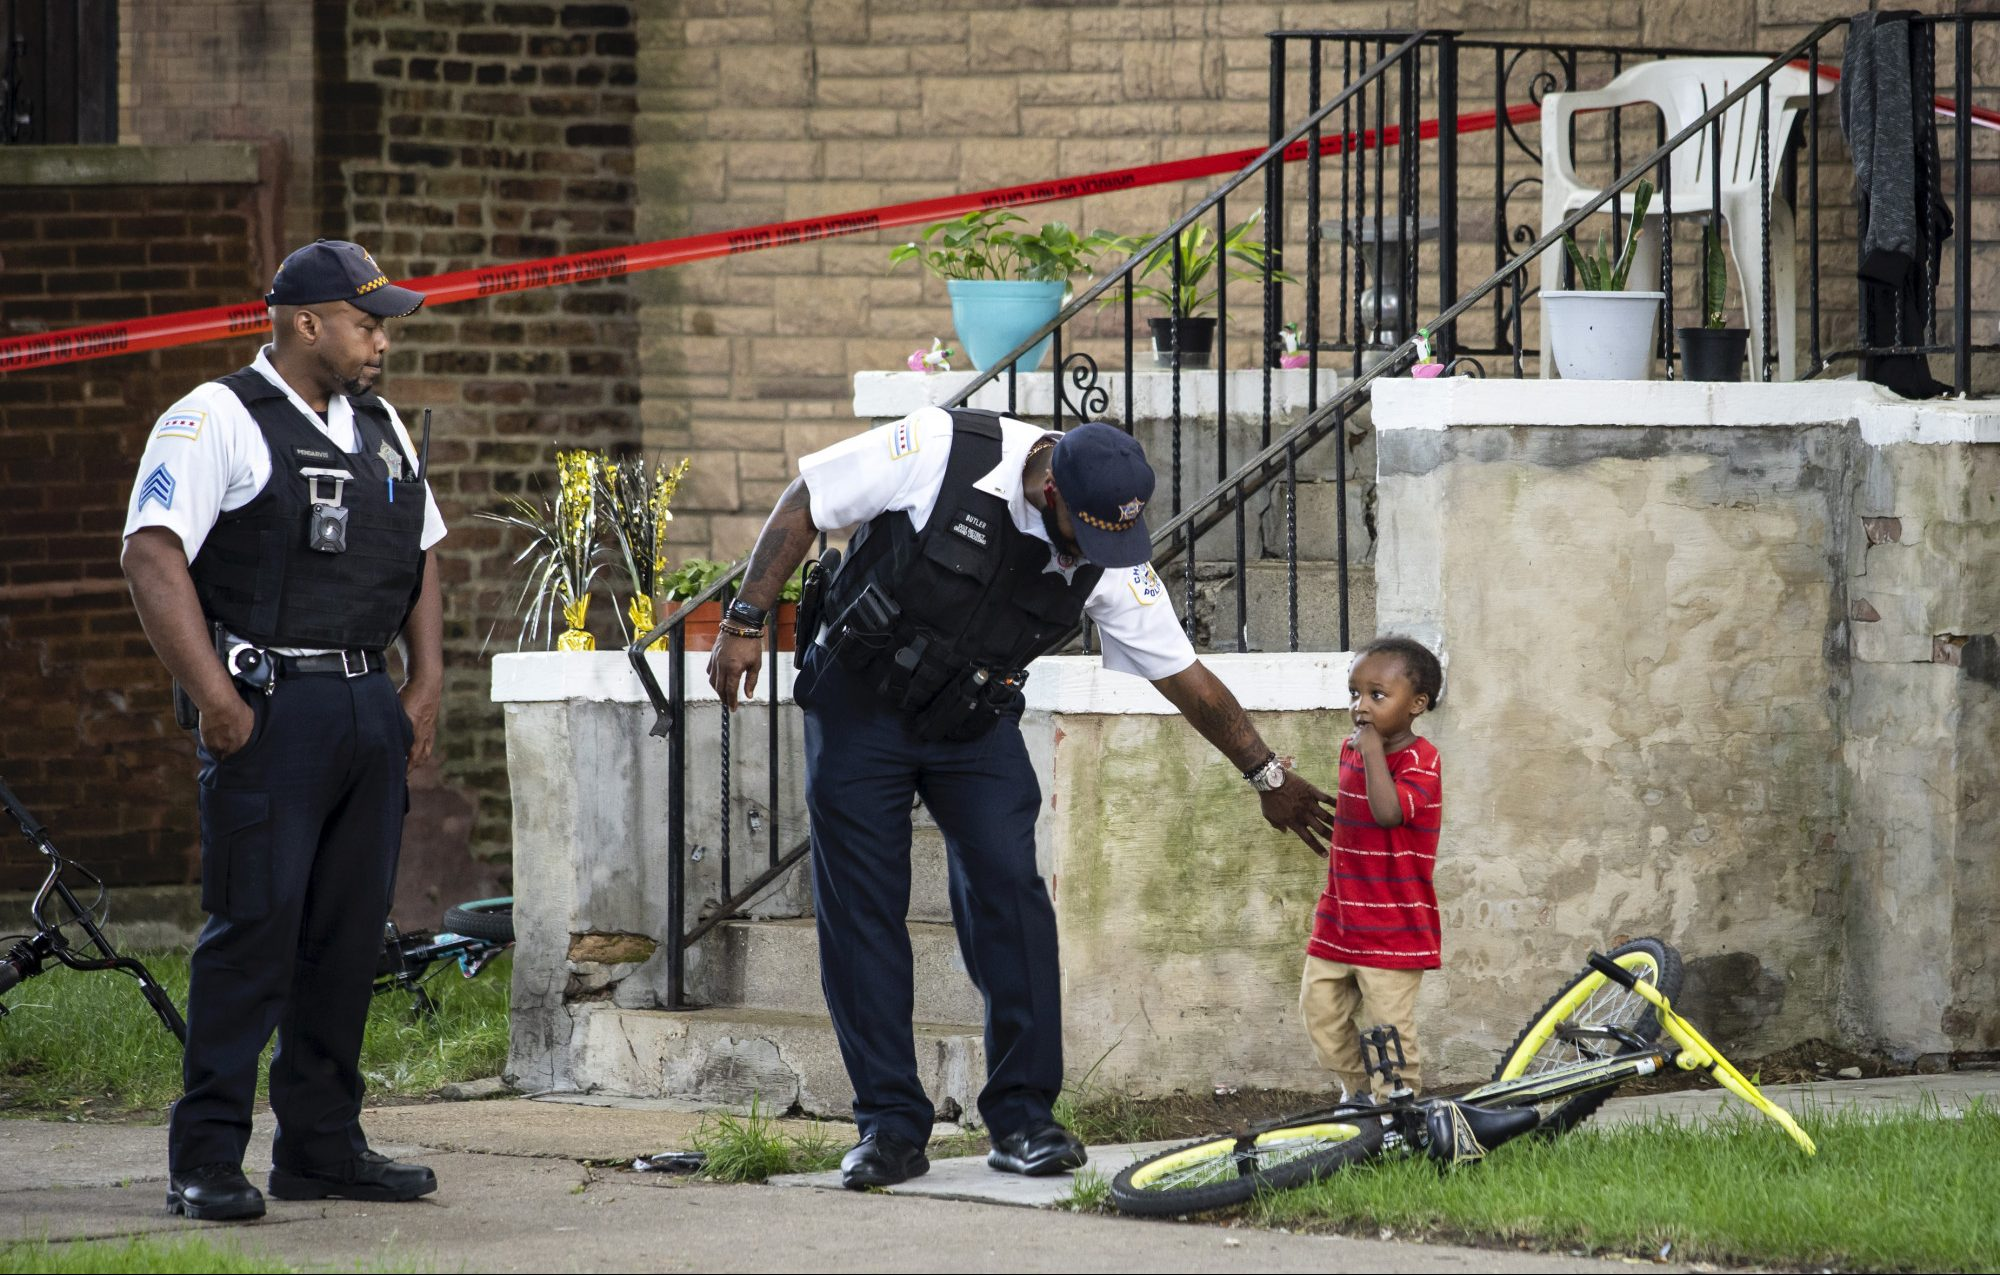 South Carolina bar shooting leaves at least 2 dead, 5